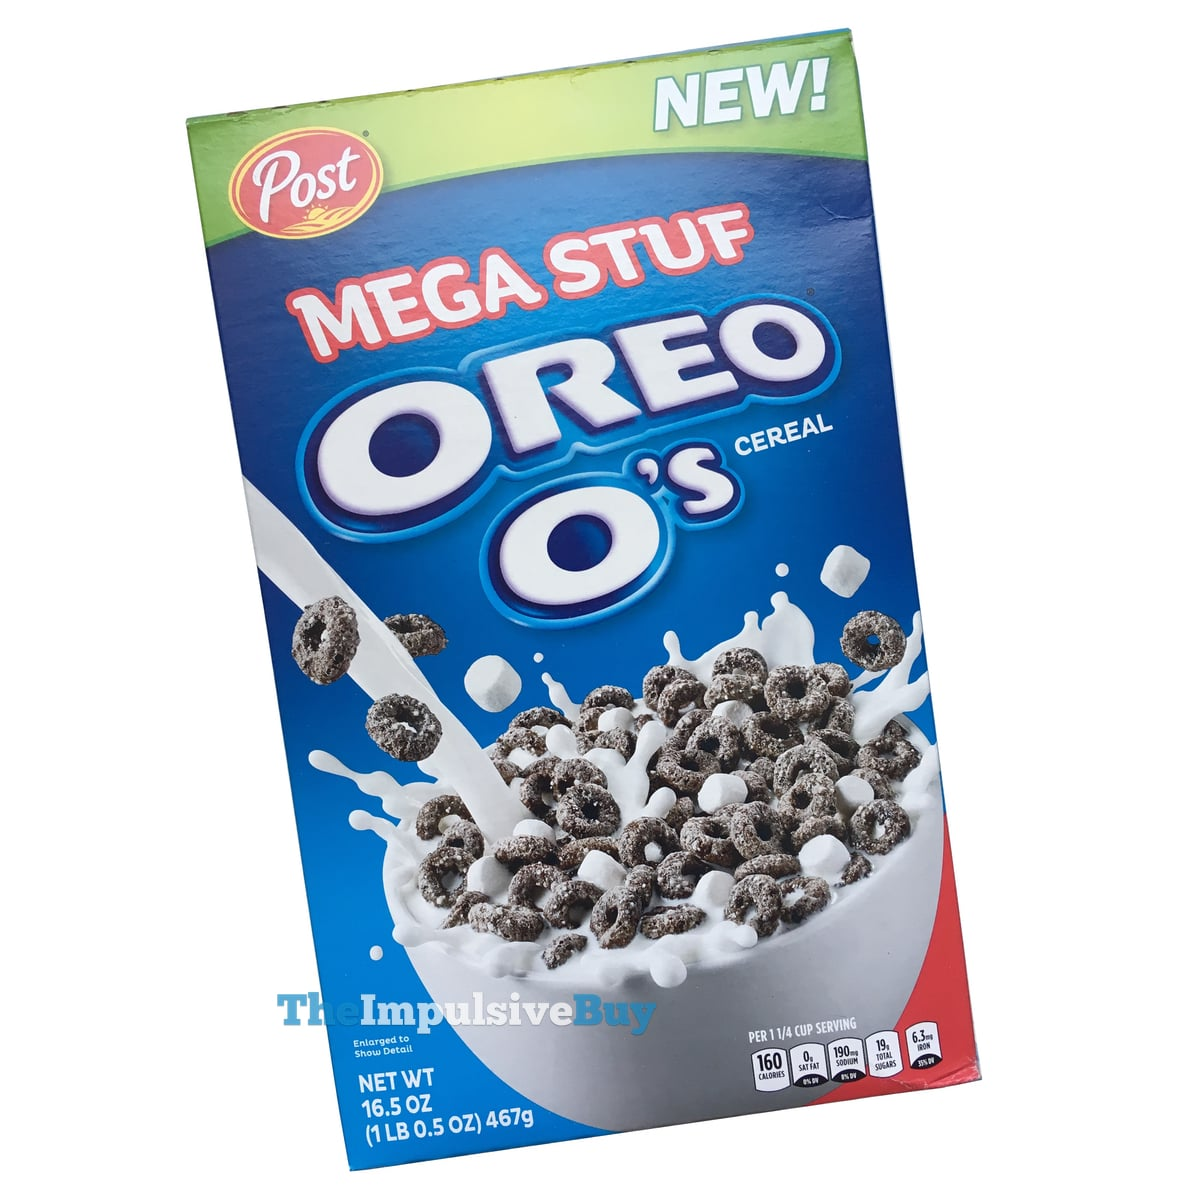 REVIEW: Post Mega Stuf Oreo O's Cereal